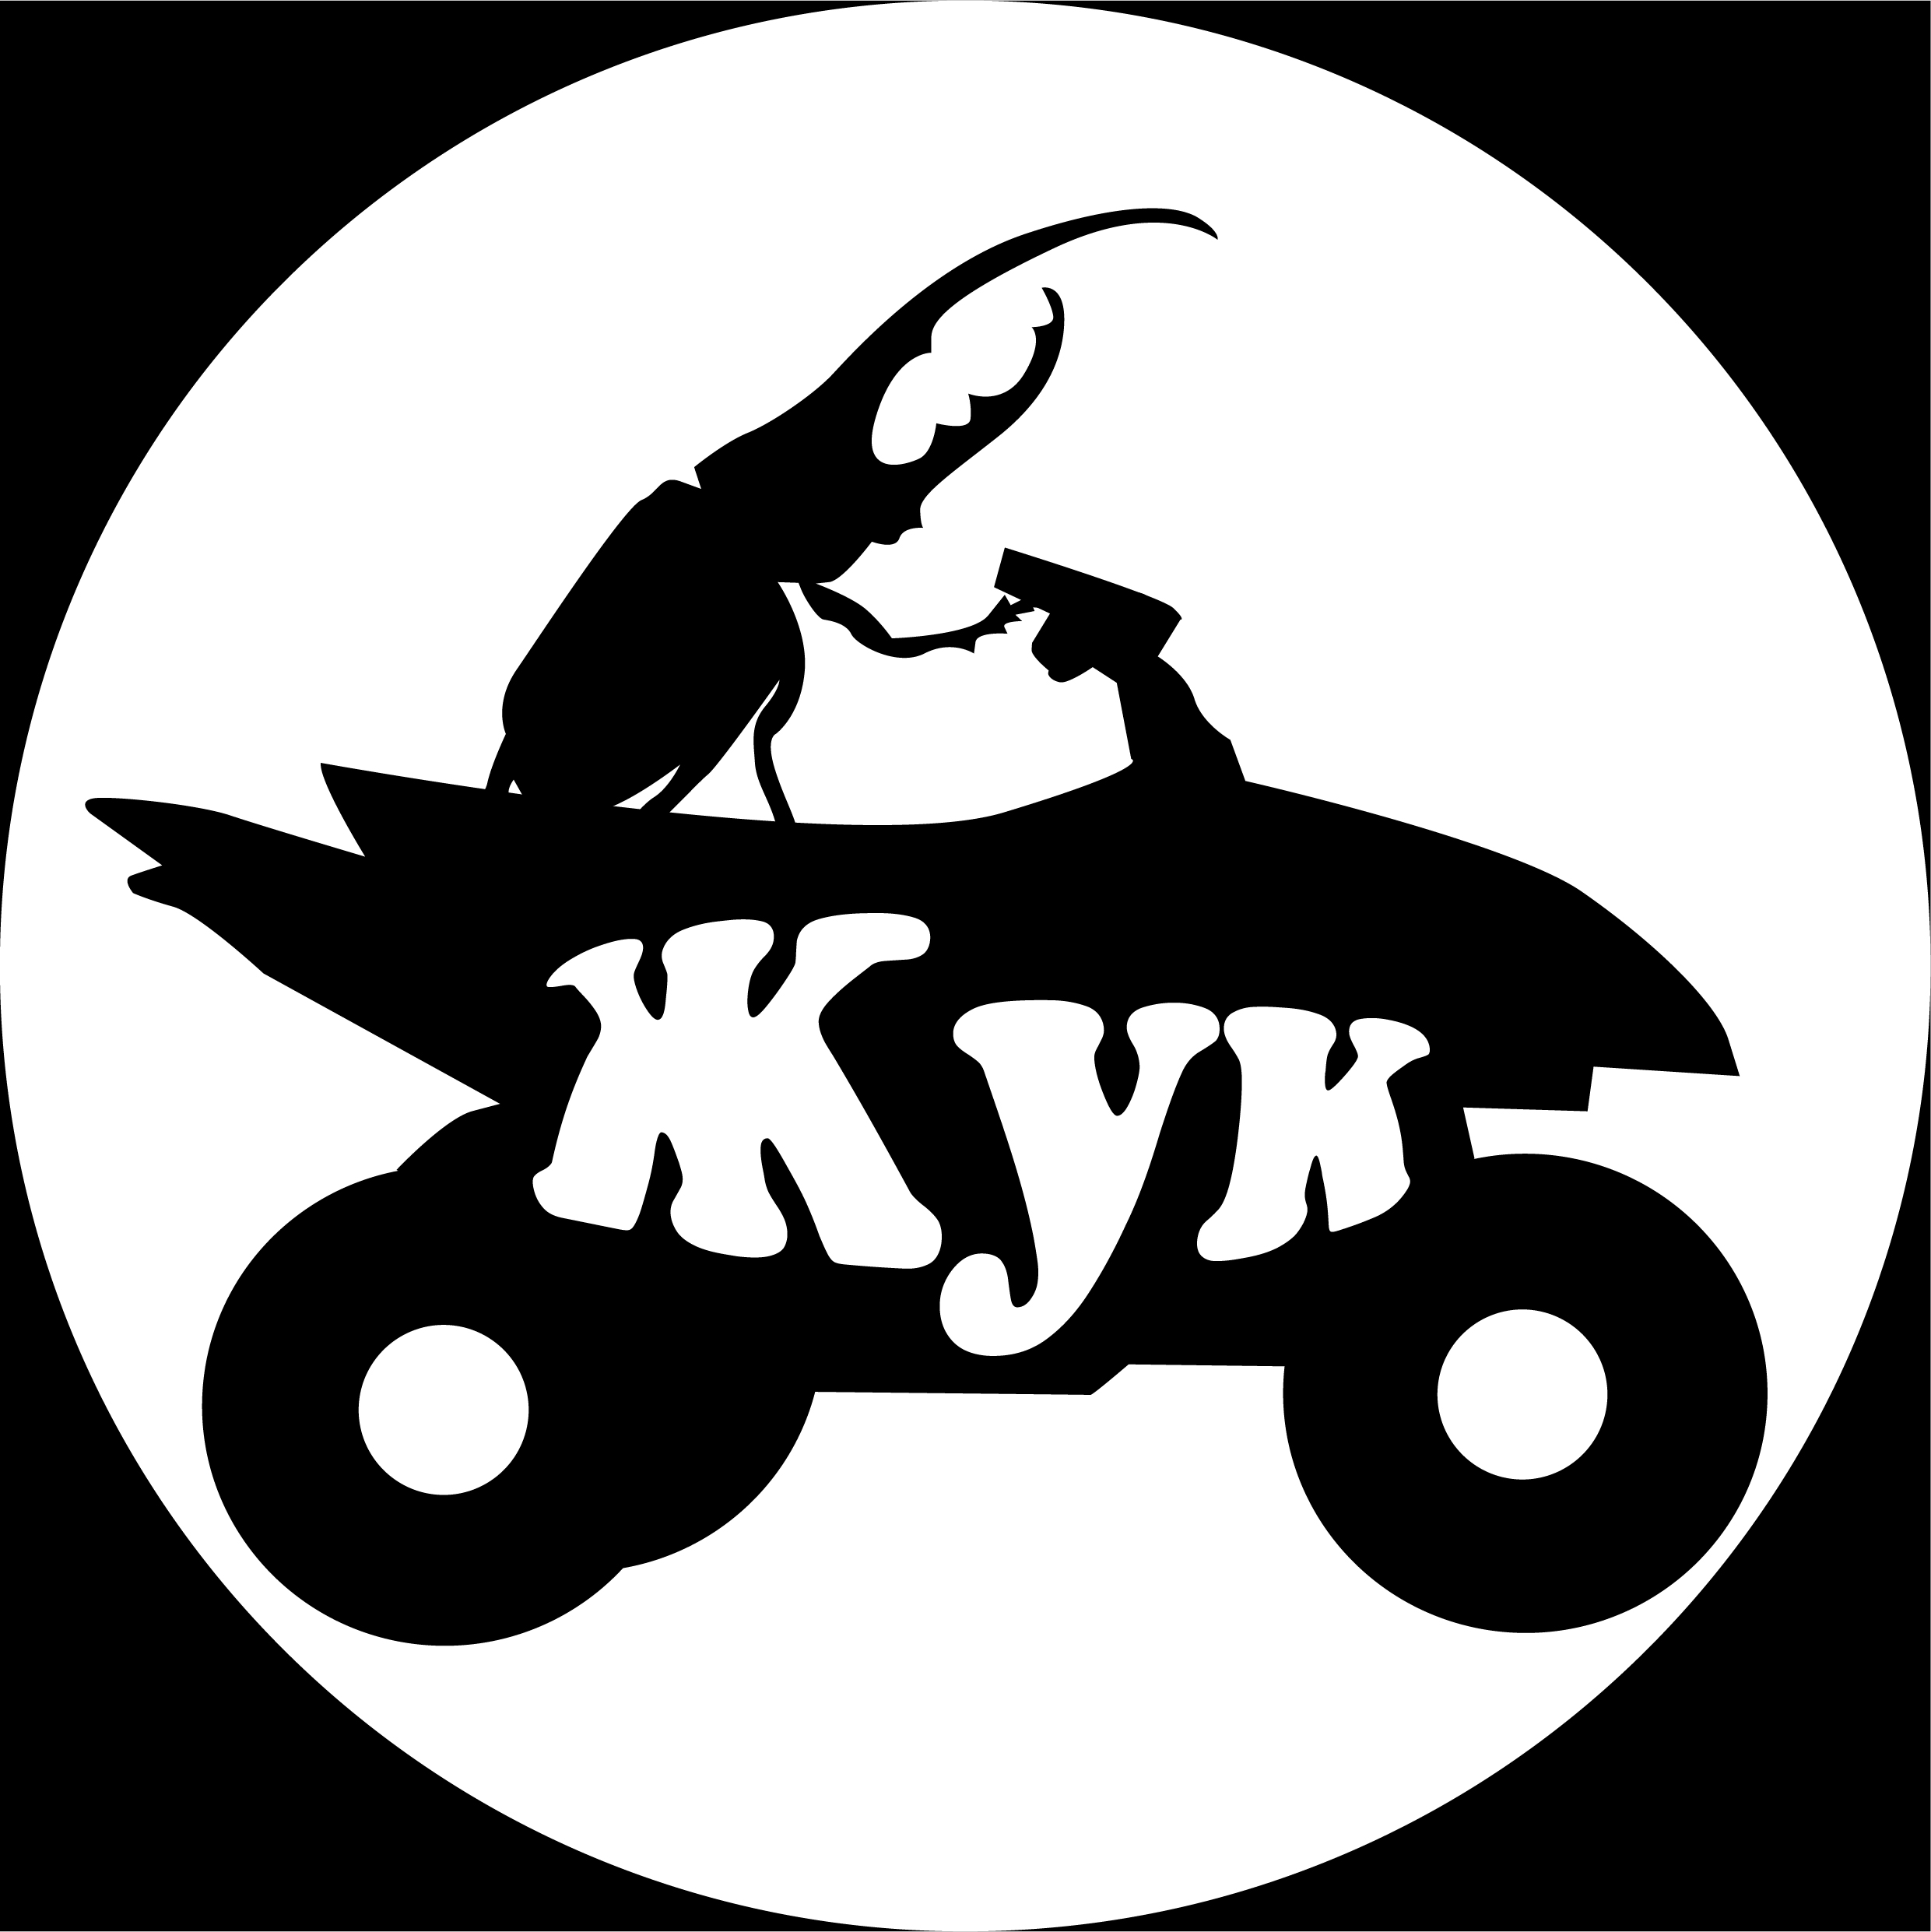 Нужен логотип (эмблема) для самодельного квадроцикла фото f_8735afc0a1b3d782.jpg